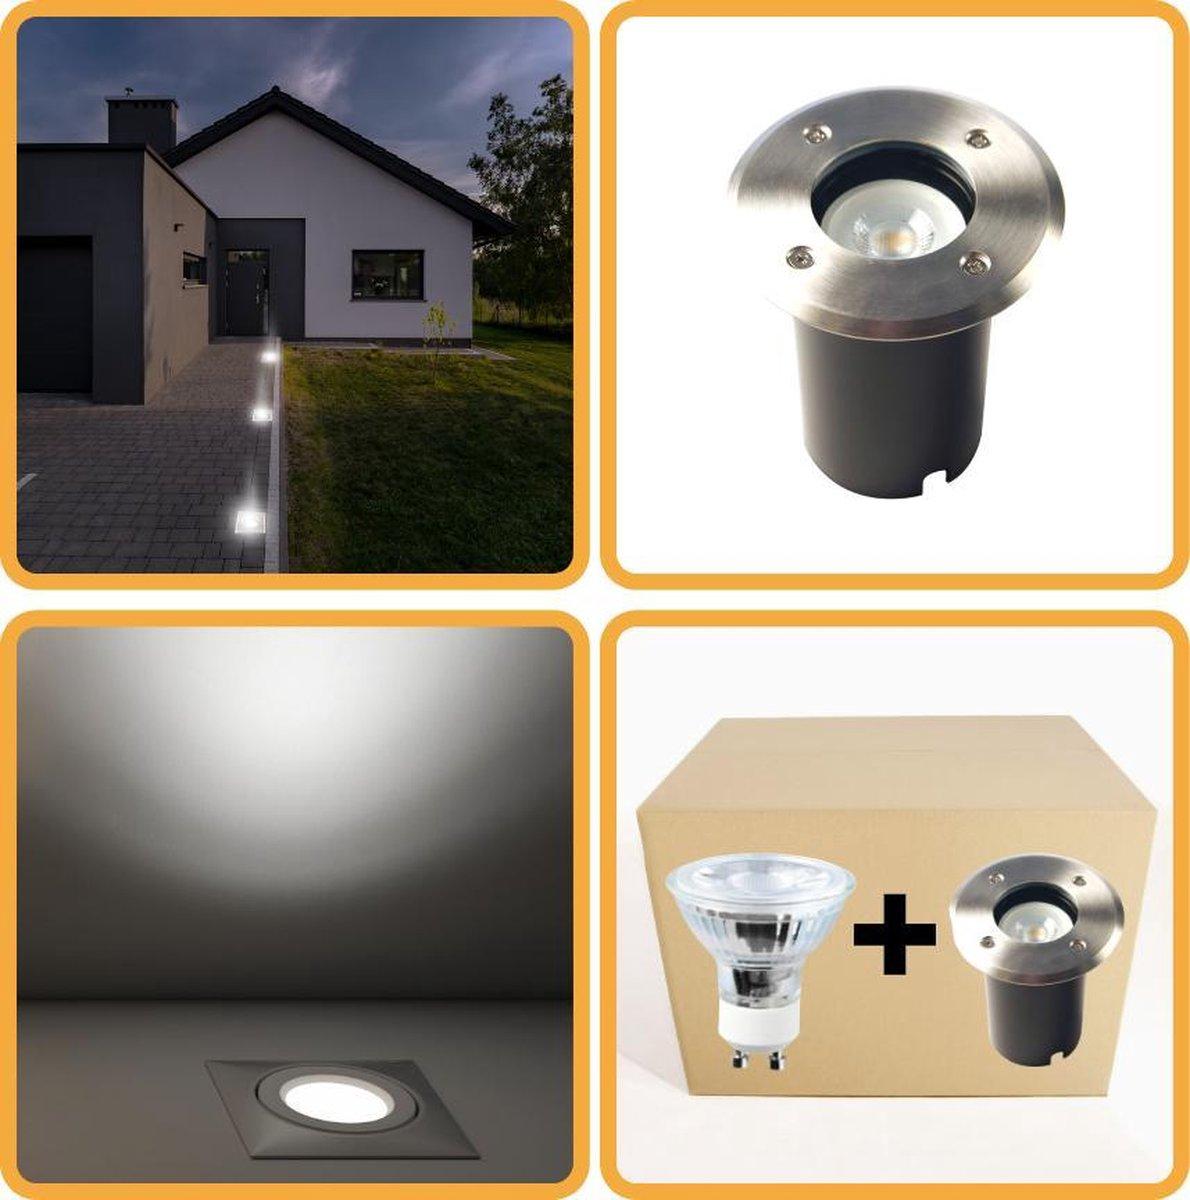 Proventa HeavyDuty LED Grondspot IP67 - Rond - inbouw tuinspot buiten - koud wit